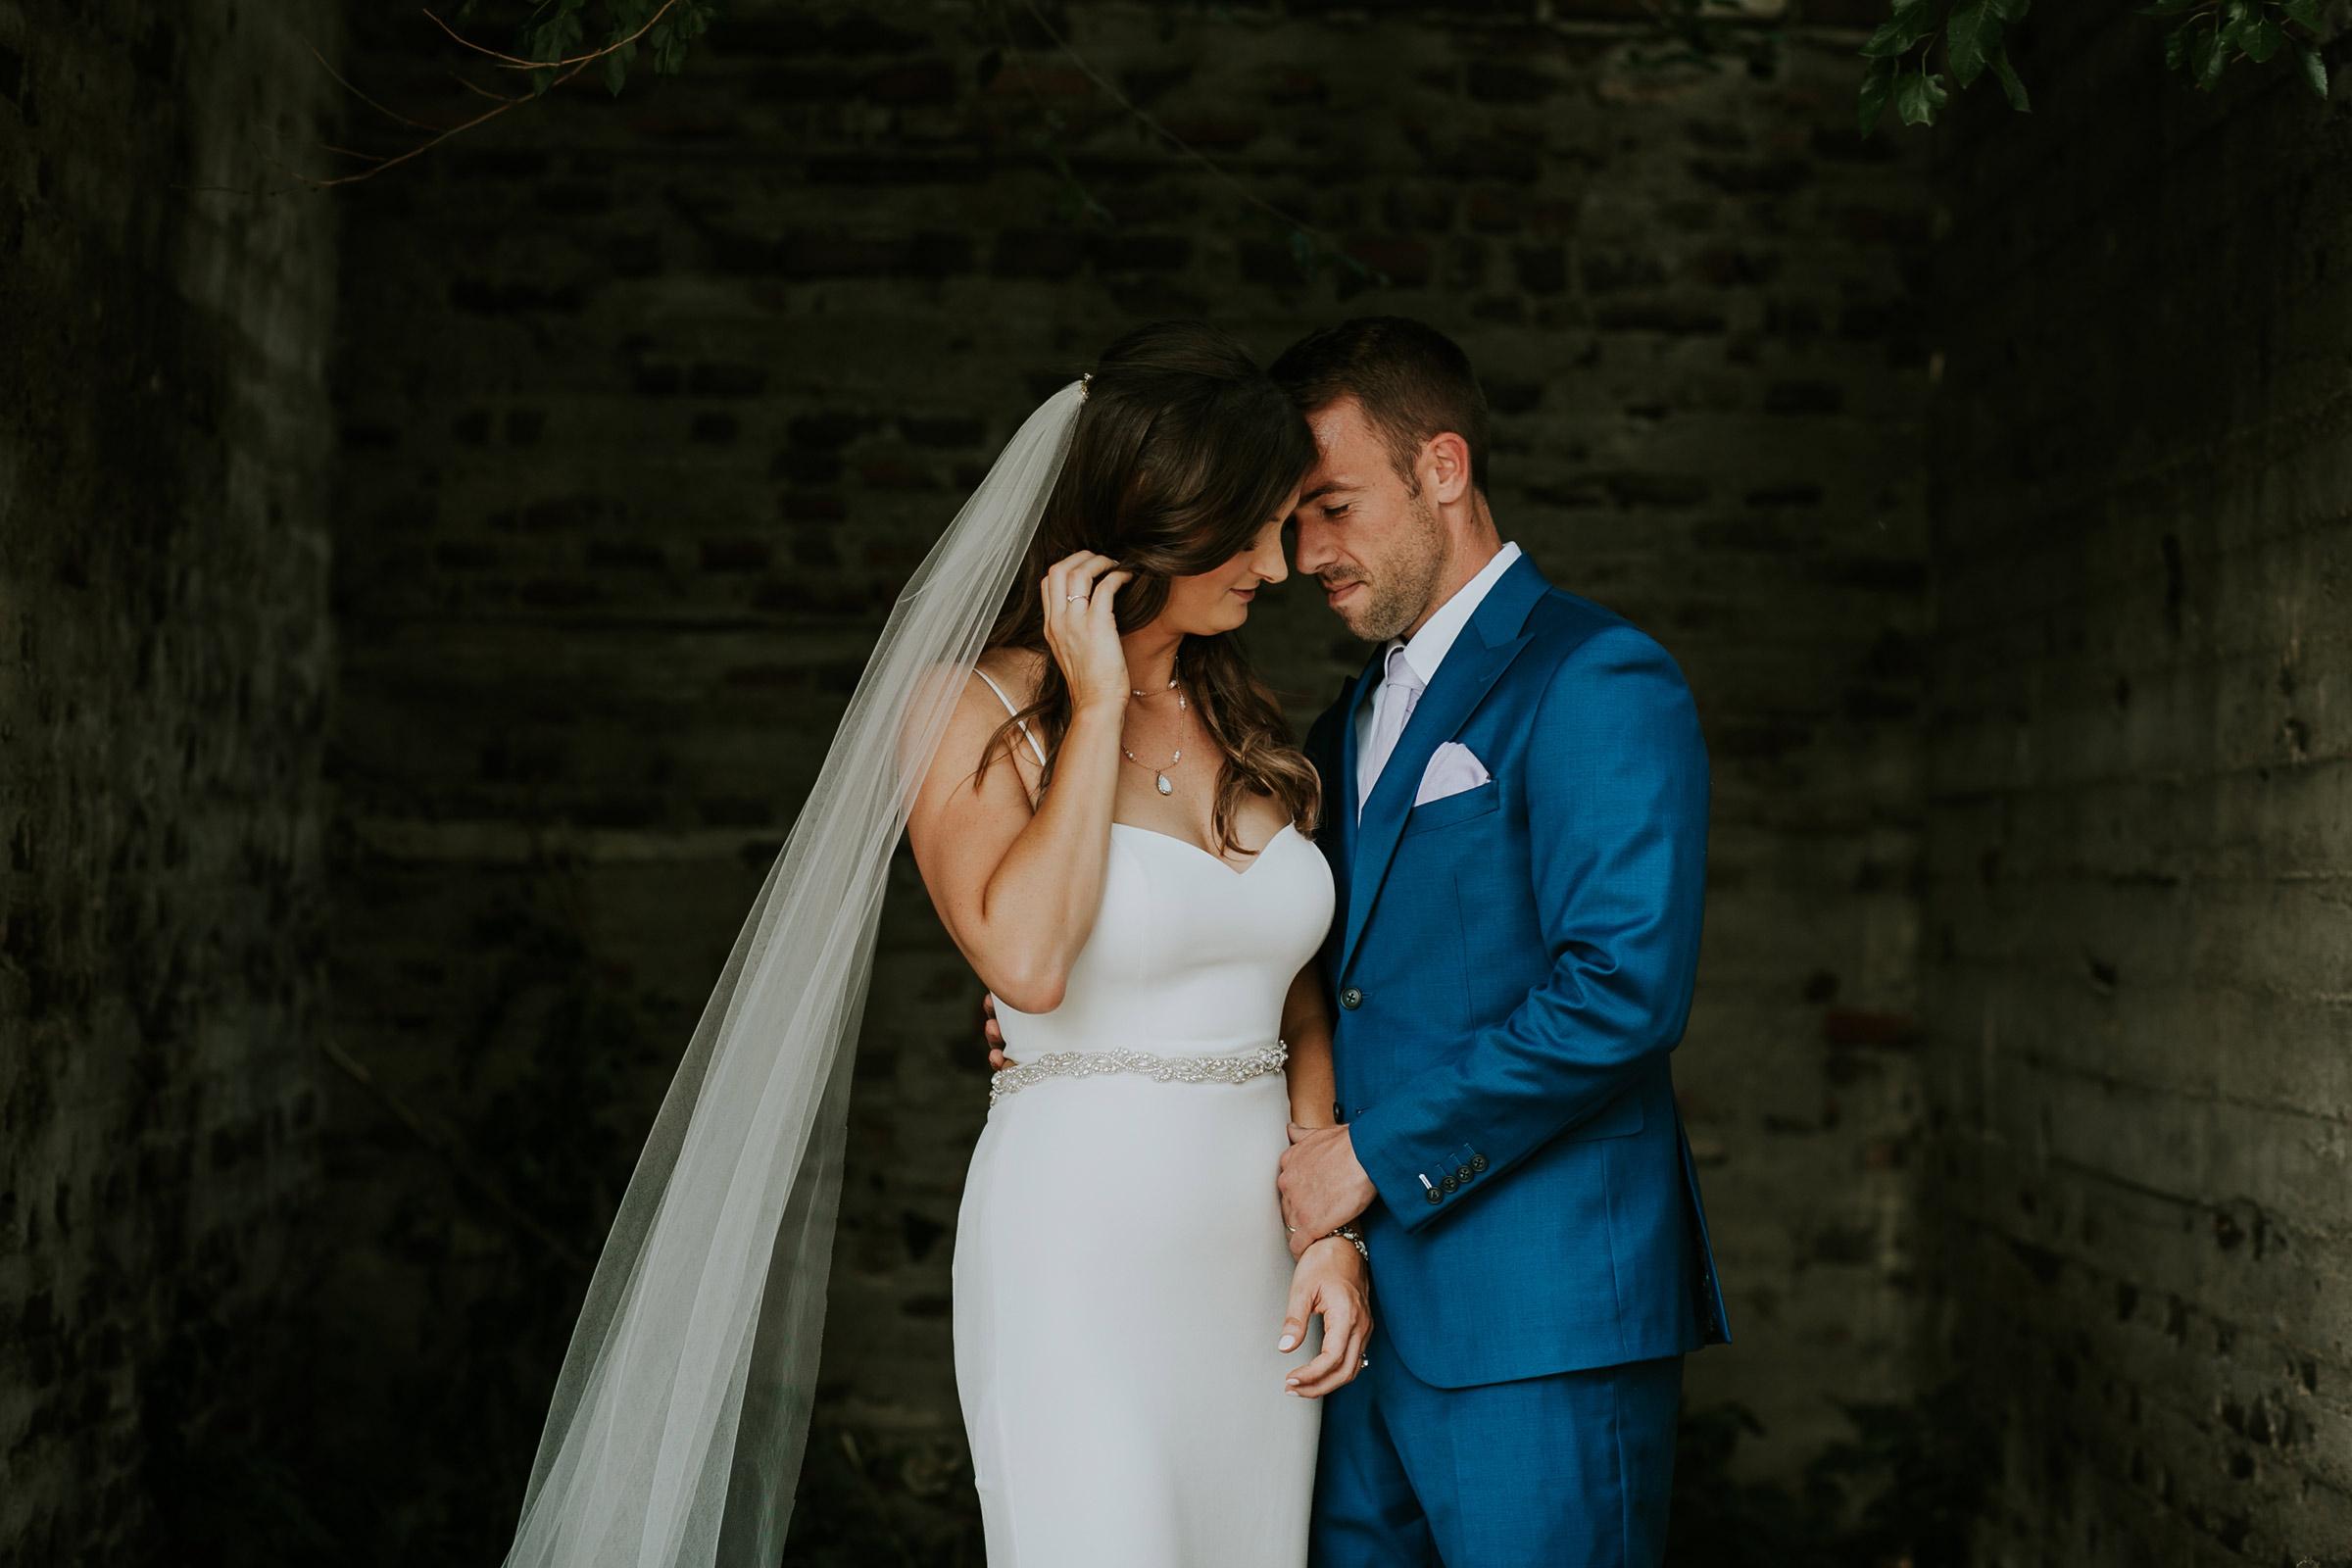 mr-mrs-hull-bride-groom-close-touching-desmoines-iowa-raelyn-ramey-photography-445.jpg